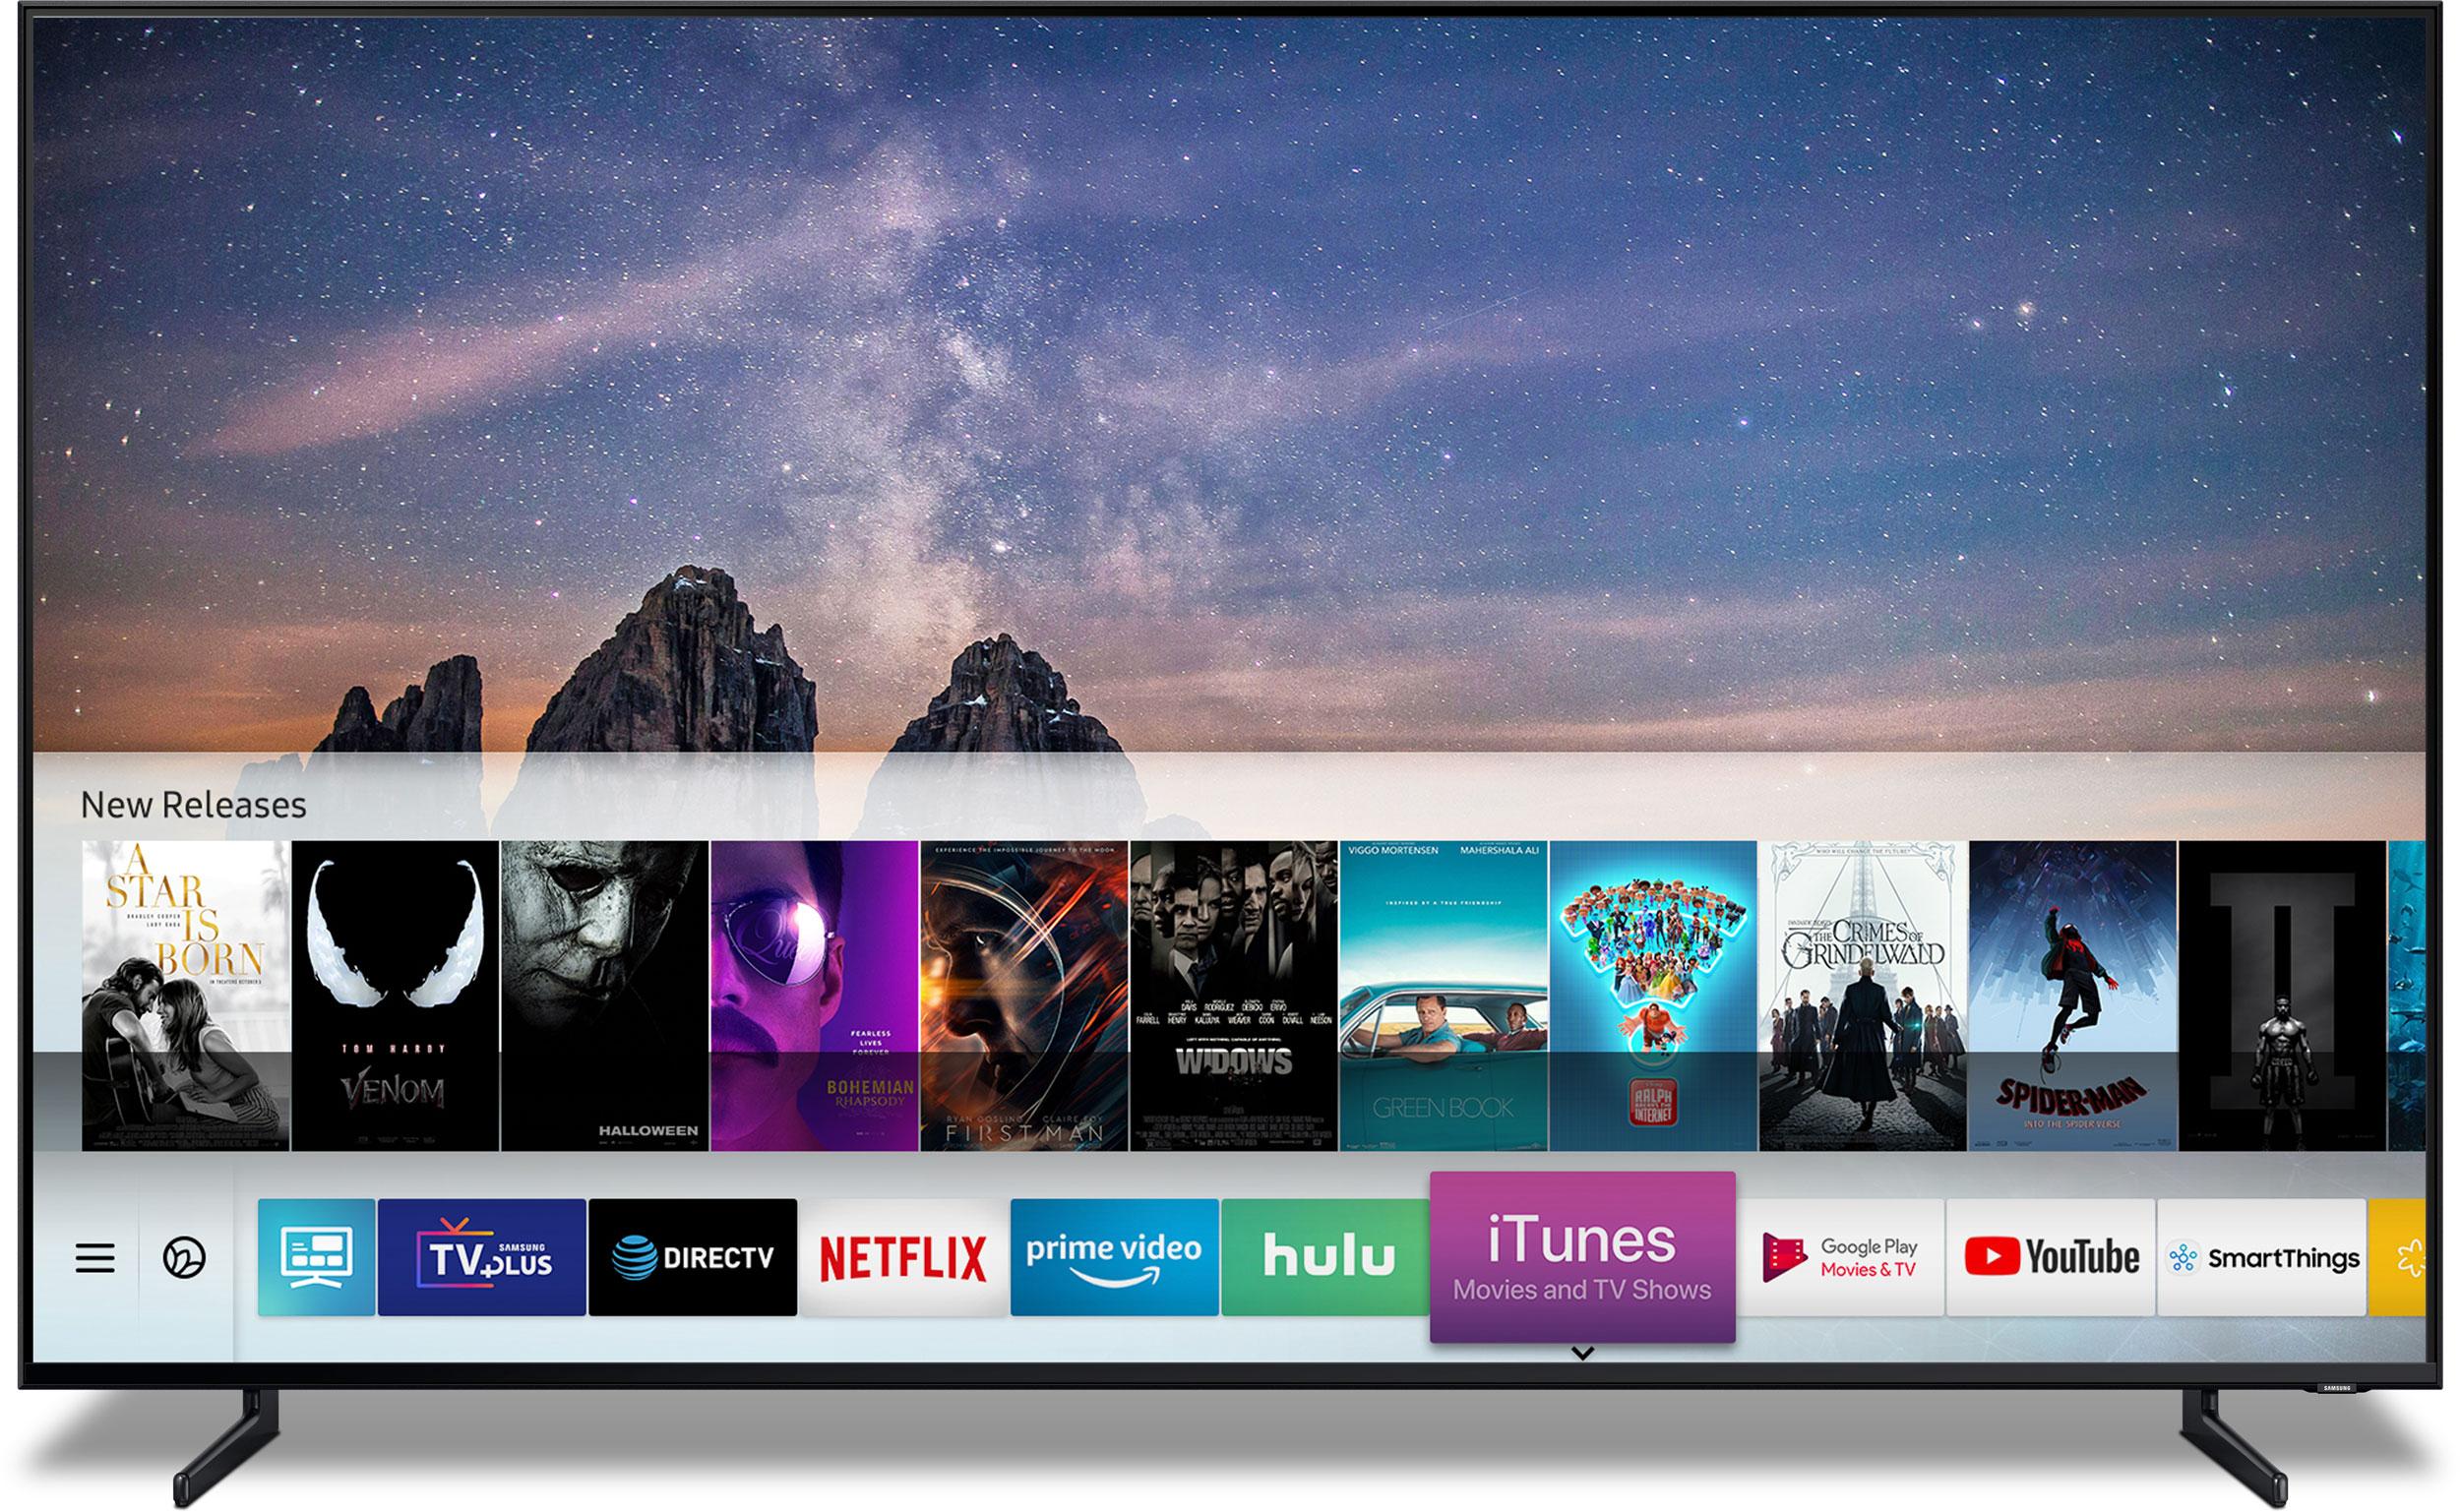 airplay samsung smart tv iphone